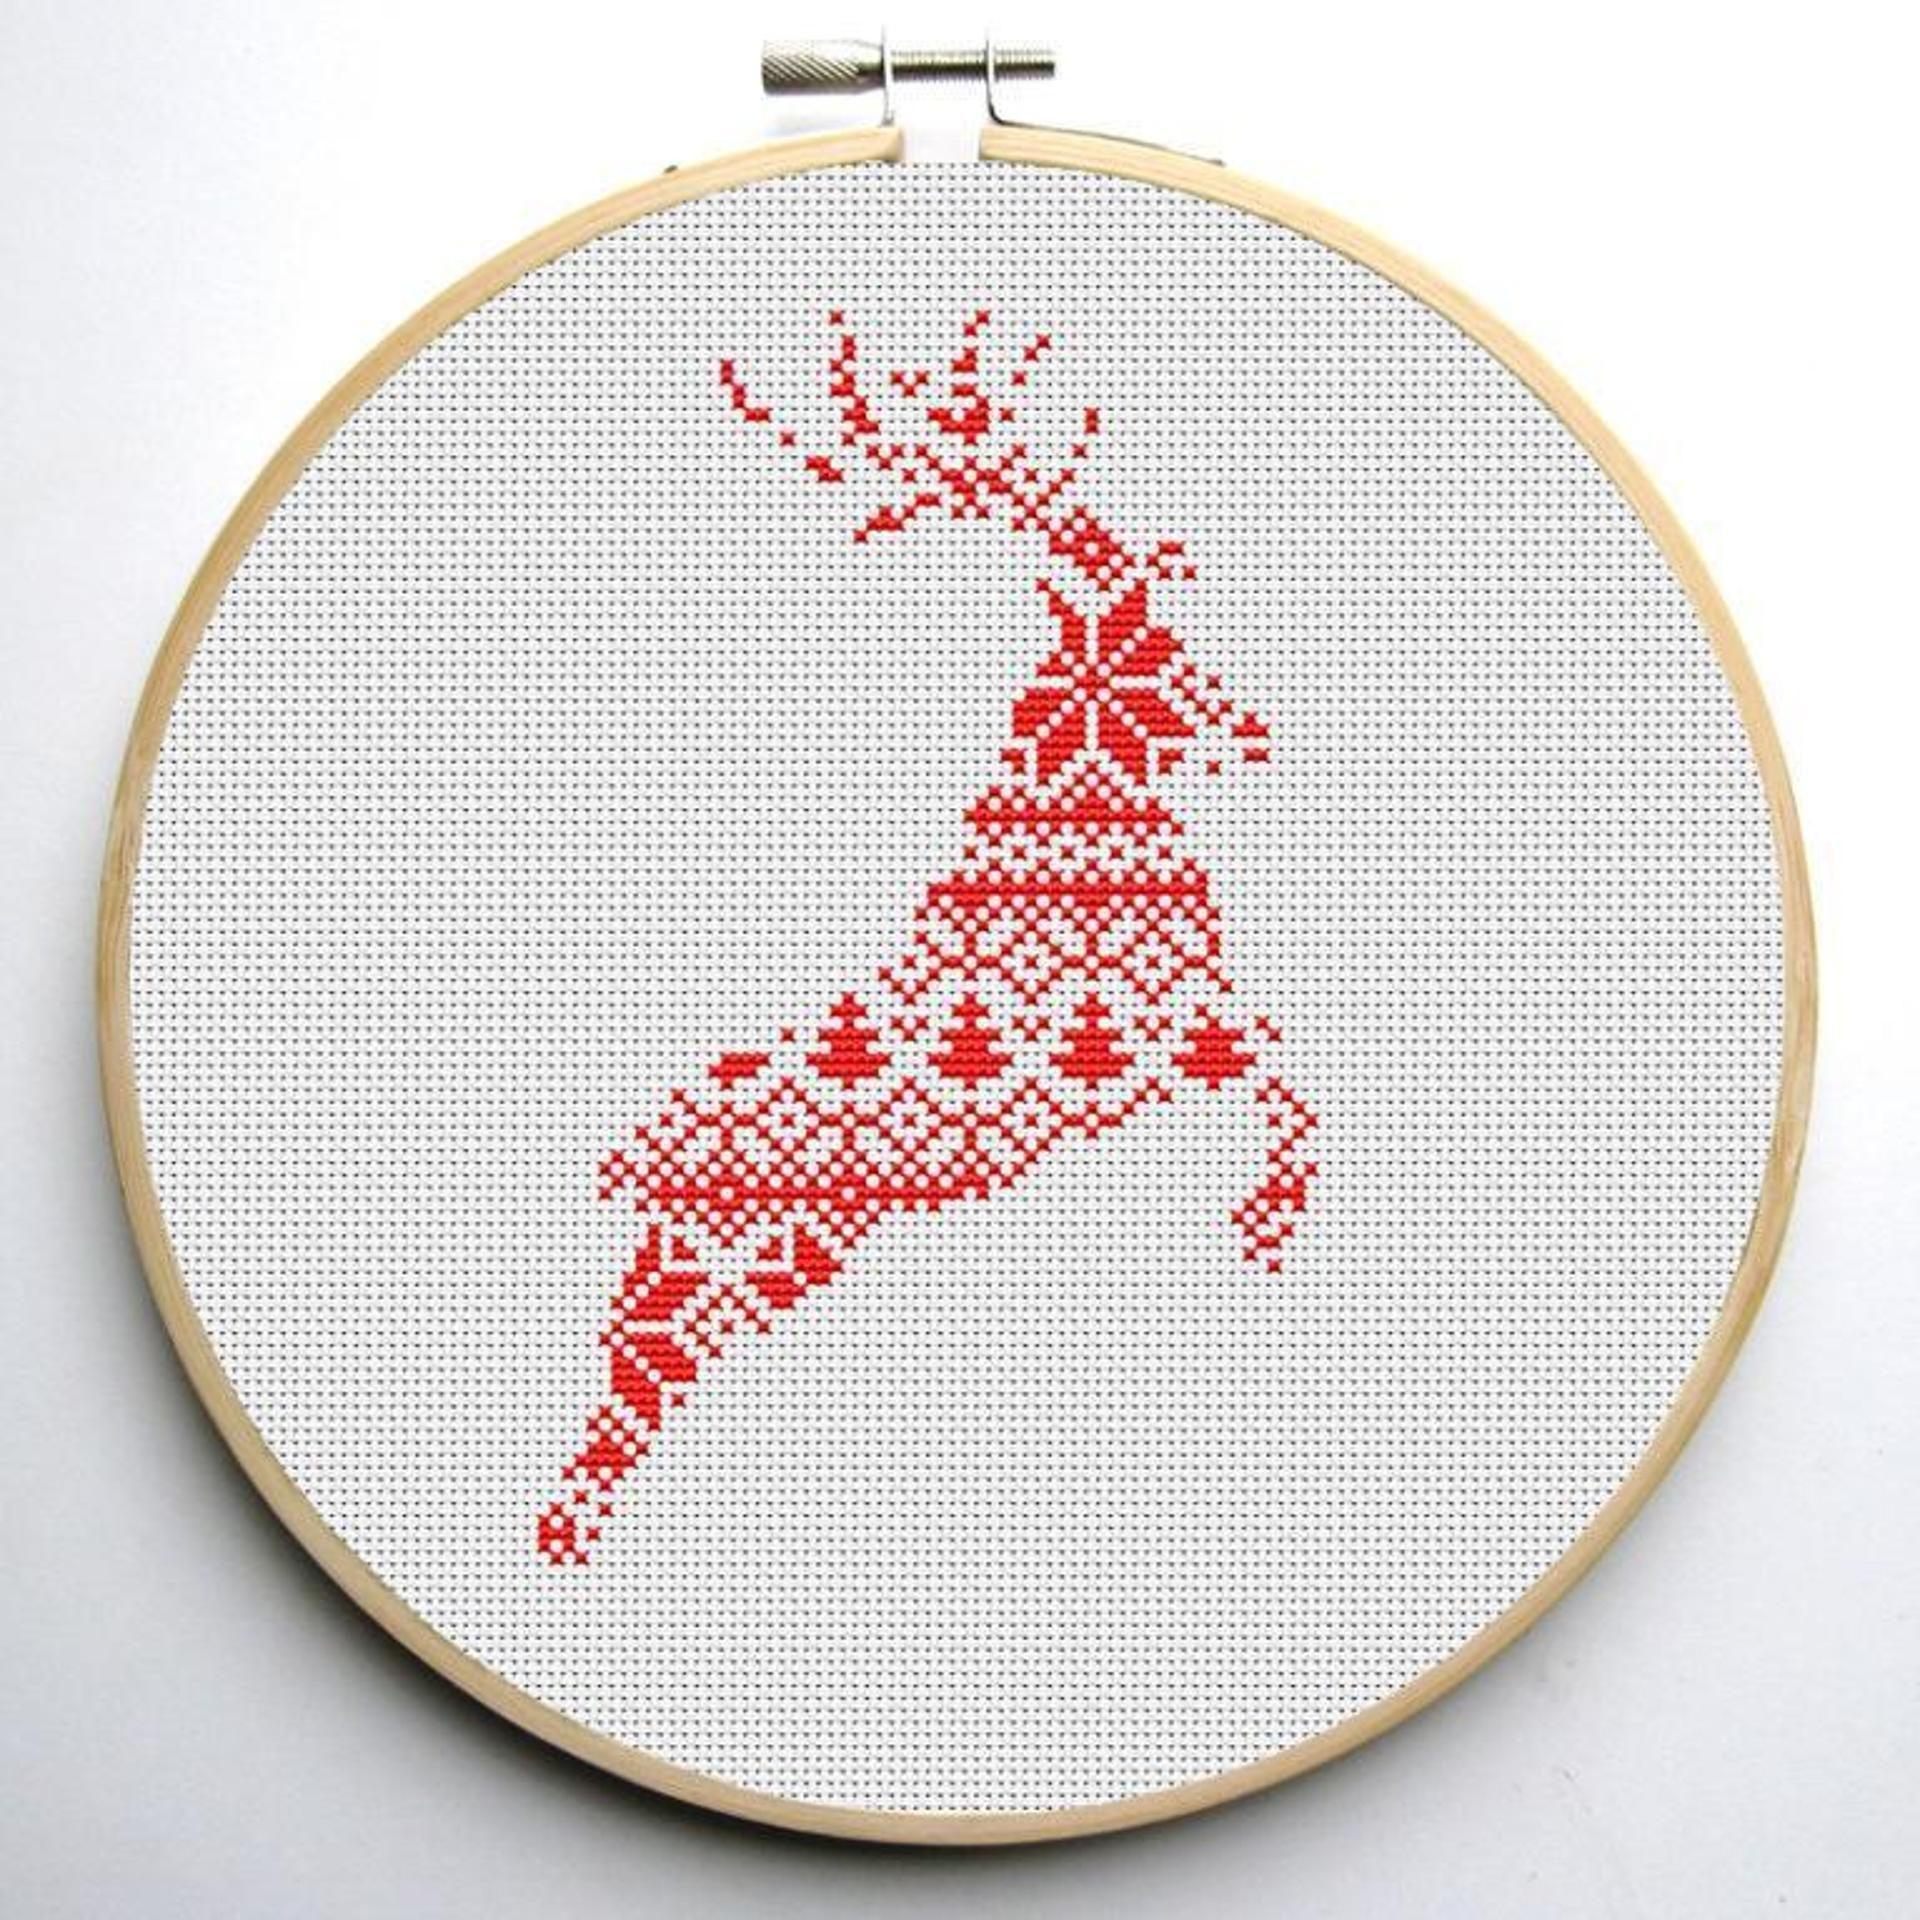 Nordic Reindeer Cross Stitch Pattern Craftsy Cross Stitch Patterns Christmas Cross Stitch Designs Cross Stitch Christmas Stockings